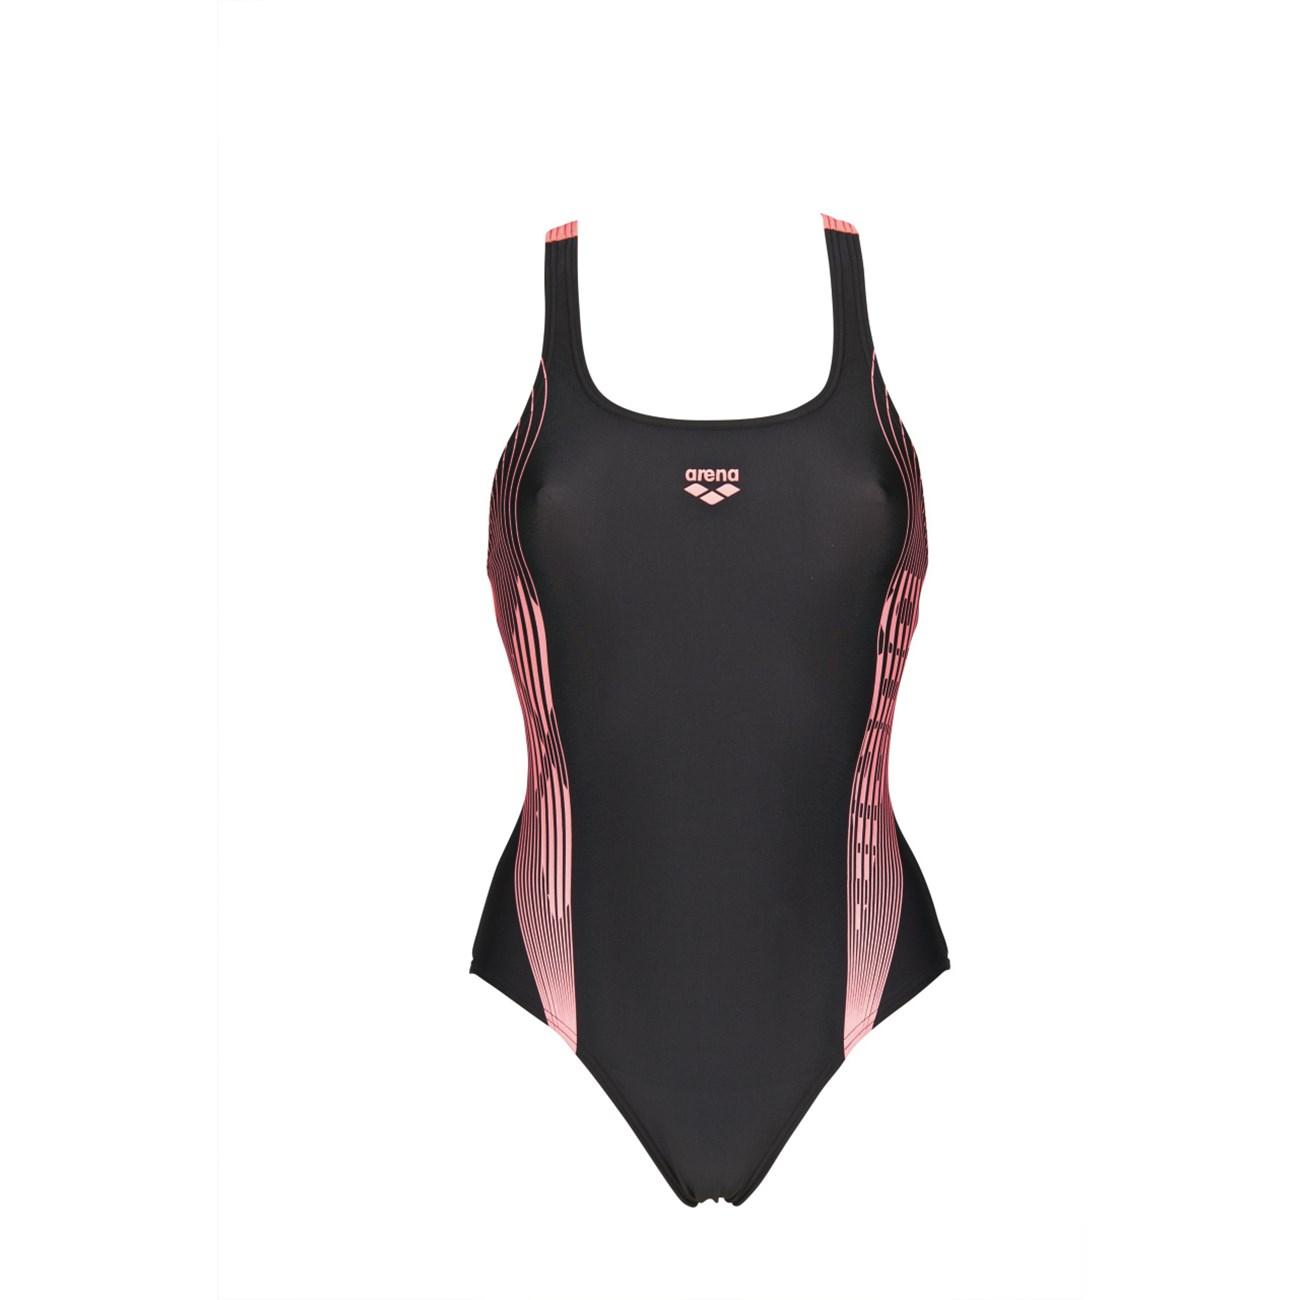 38d98d5ed32 ARENA W TWINKLE SWIM PRO ONE PIECE < Μαγιό Κολύμβησης | INTERSPORT